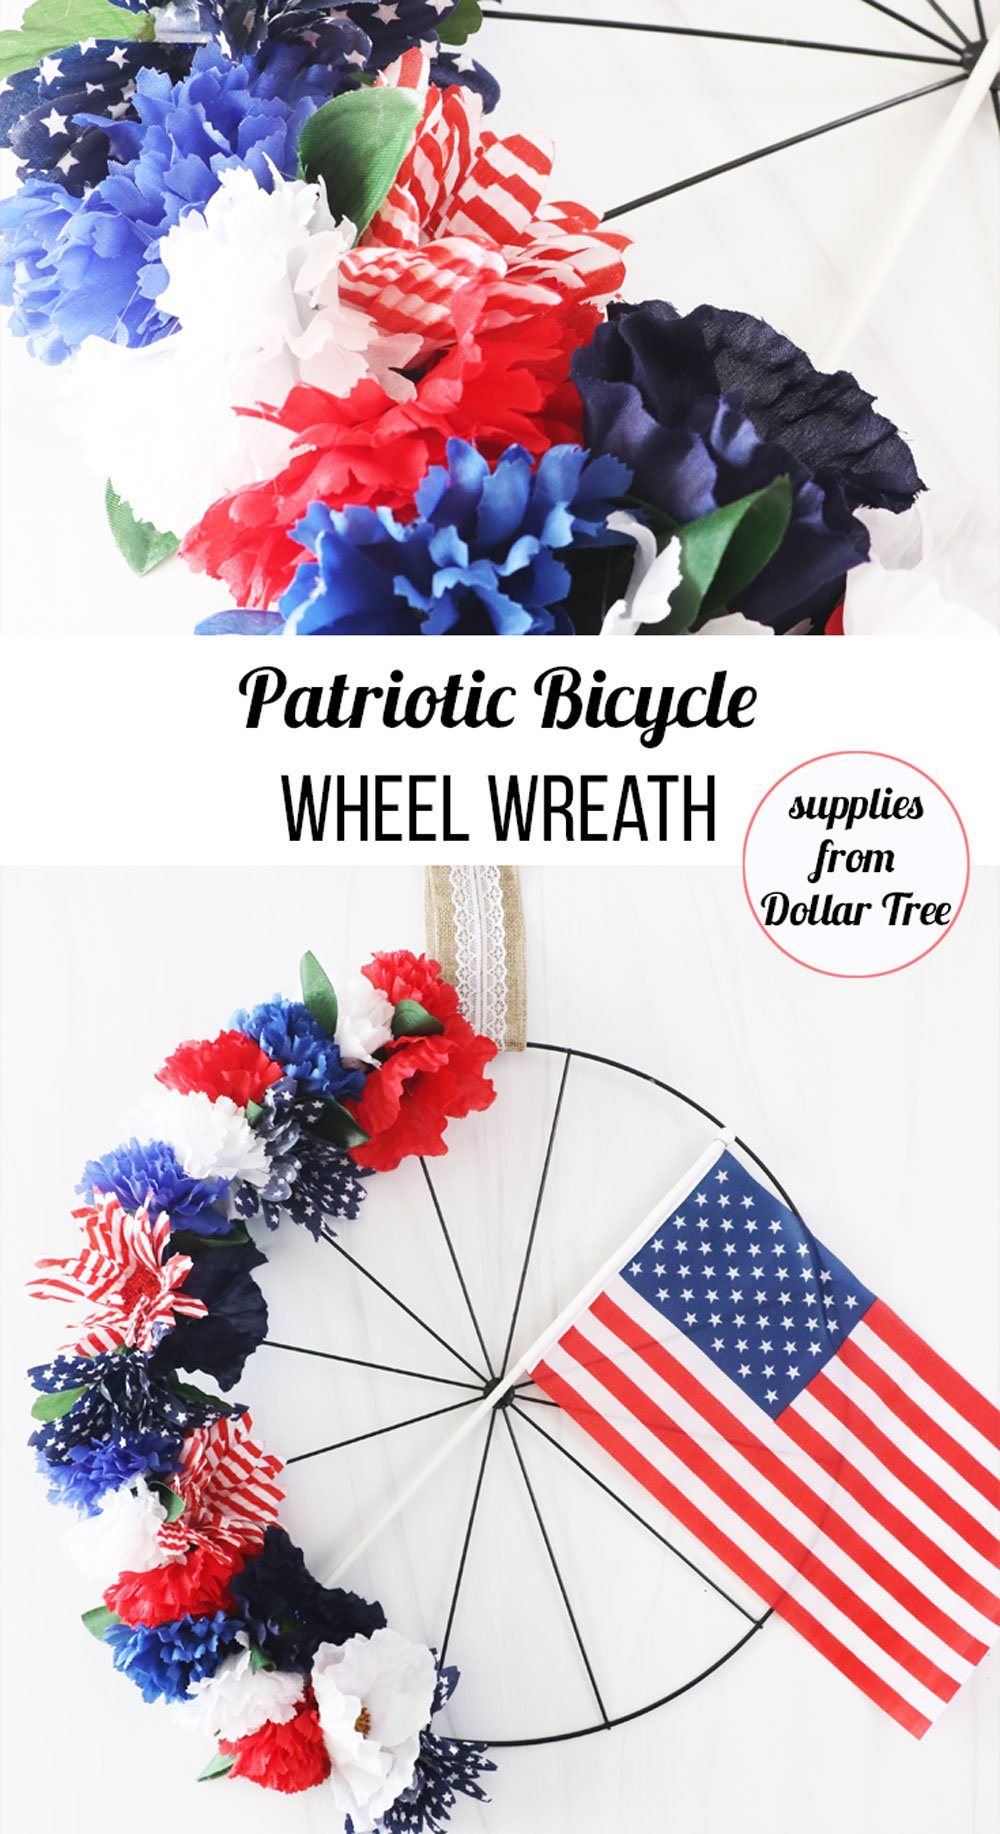 how to make patriotic bicycle wheel wreath